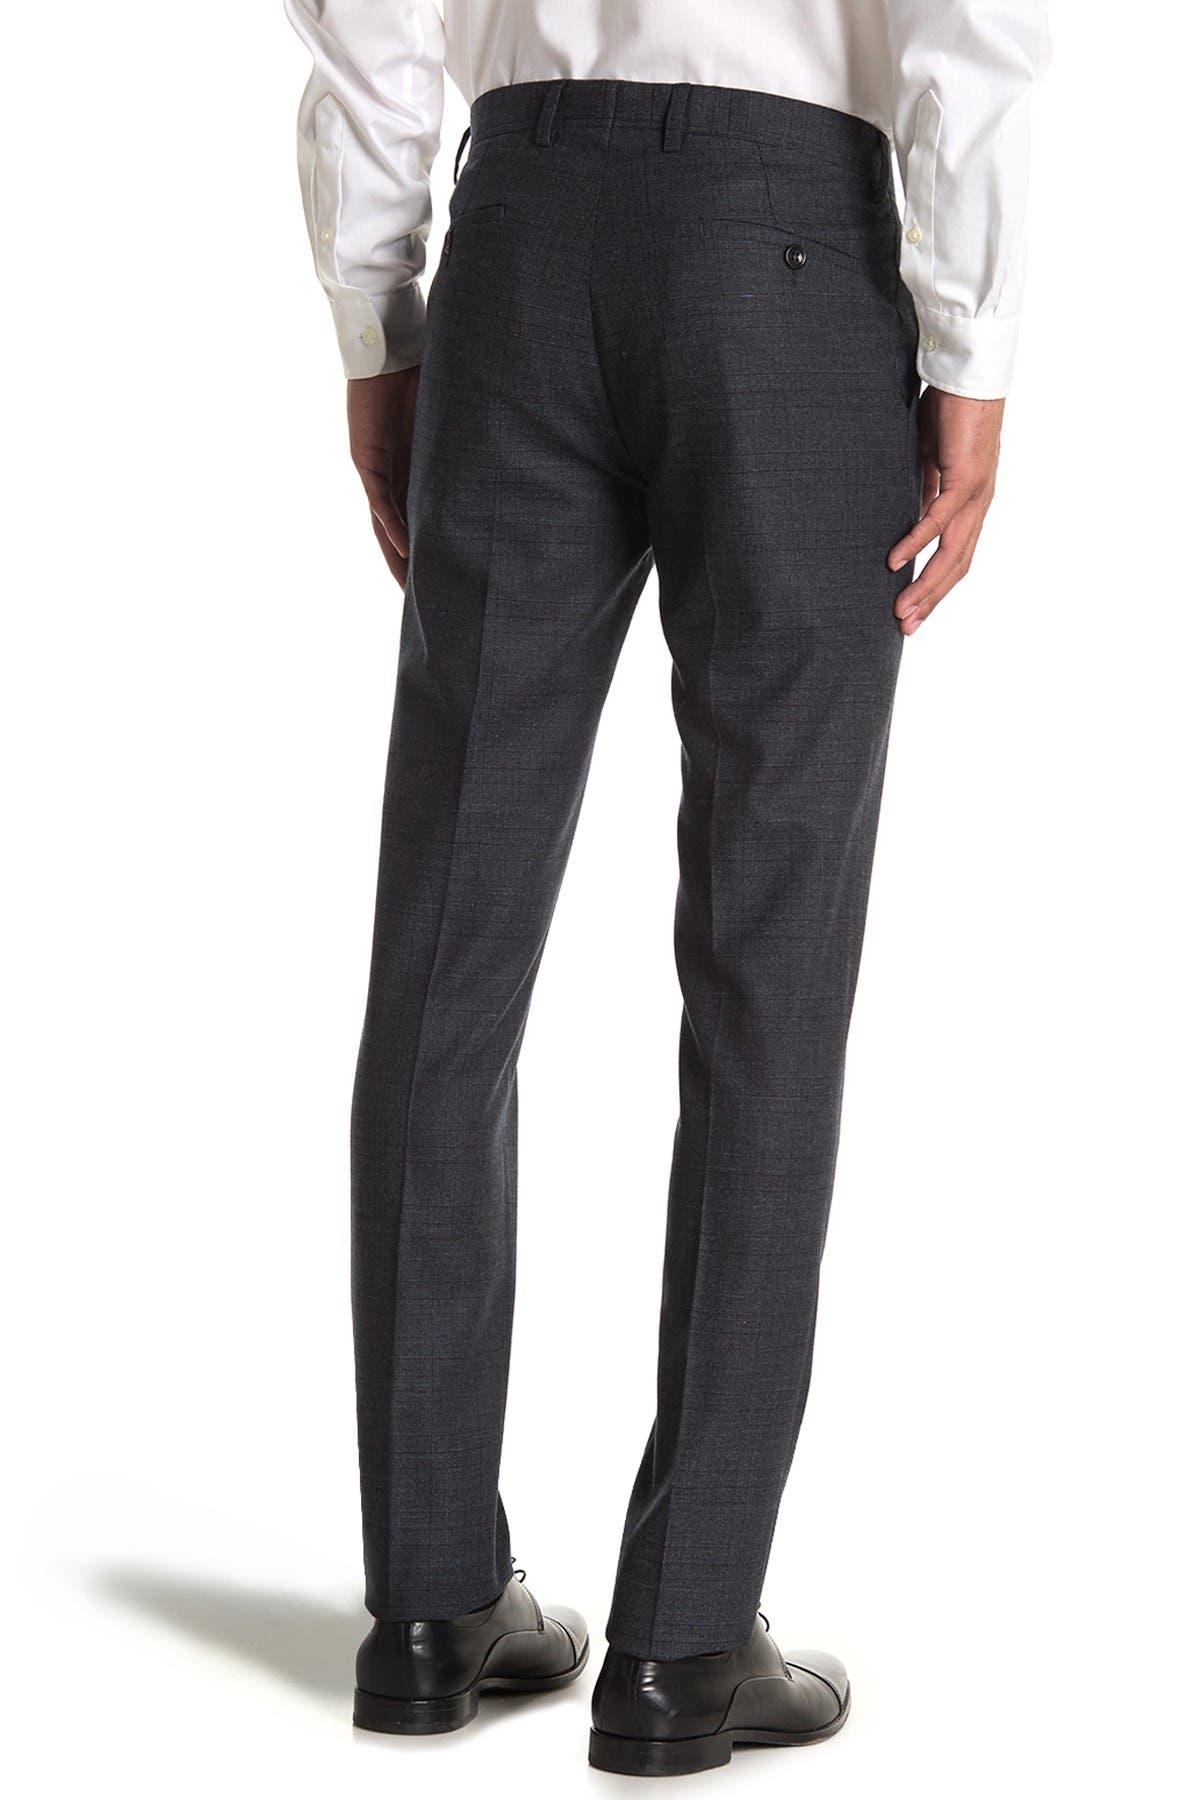 Image of Good Man Brand Slim Fit Wool Blend Trousers